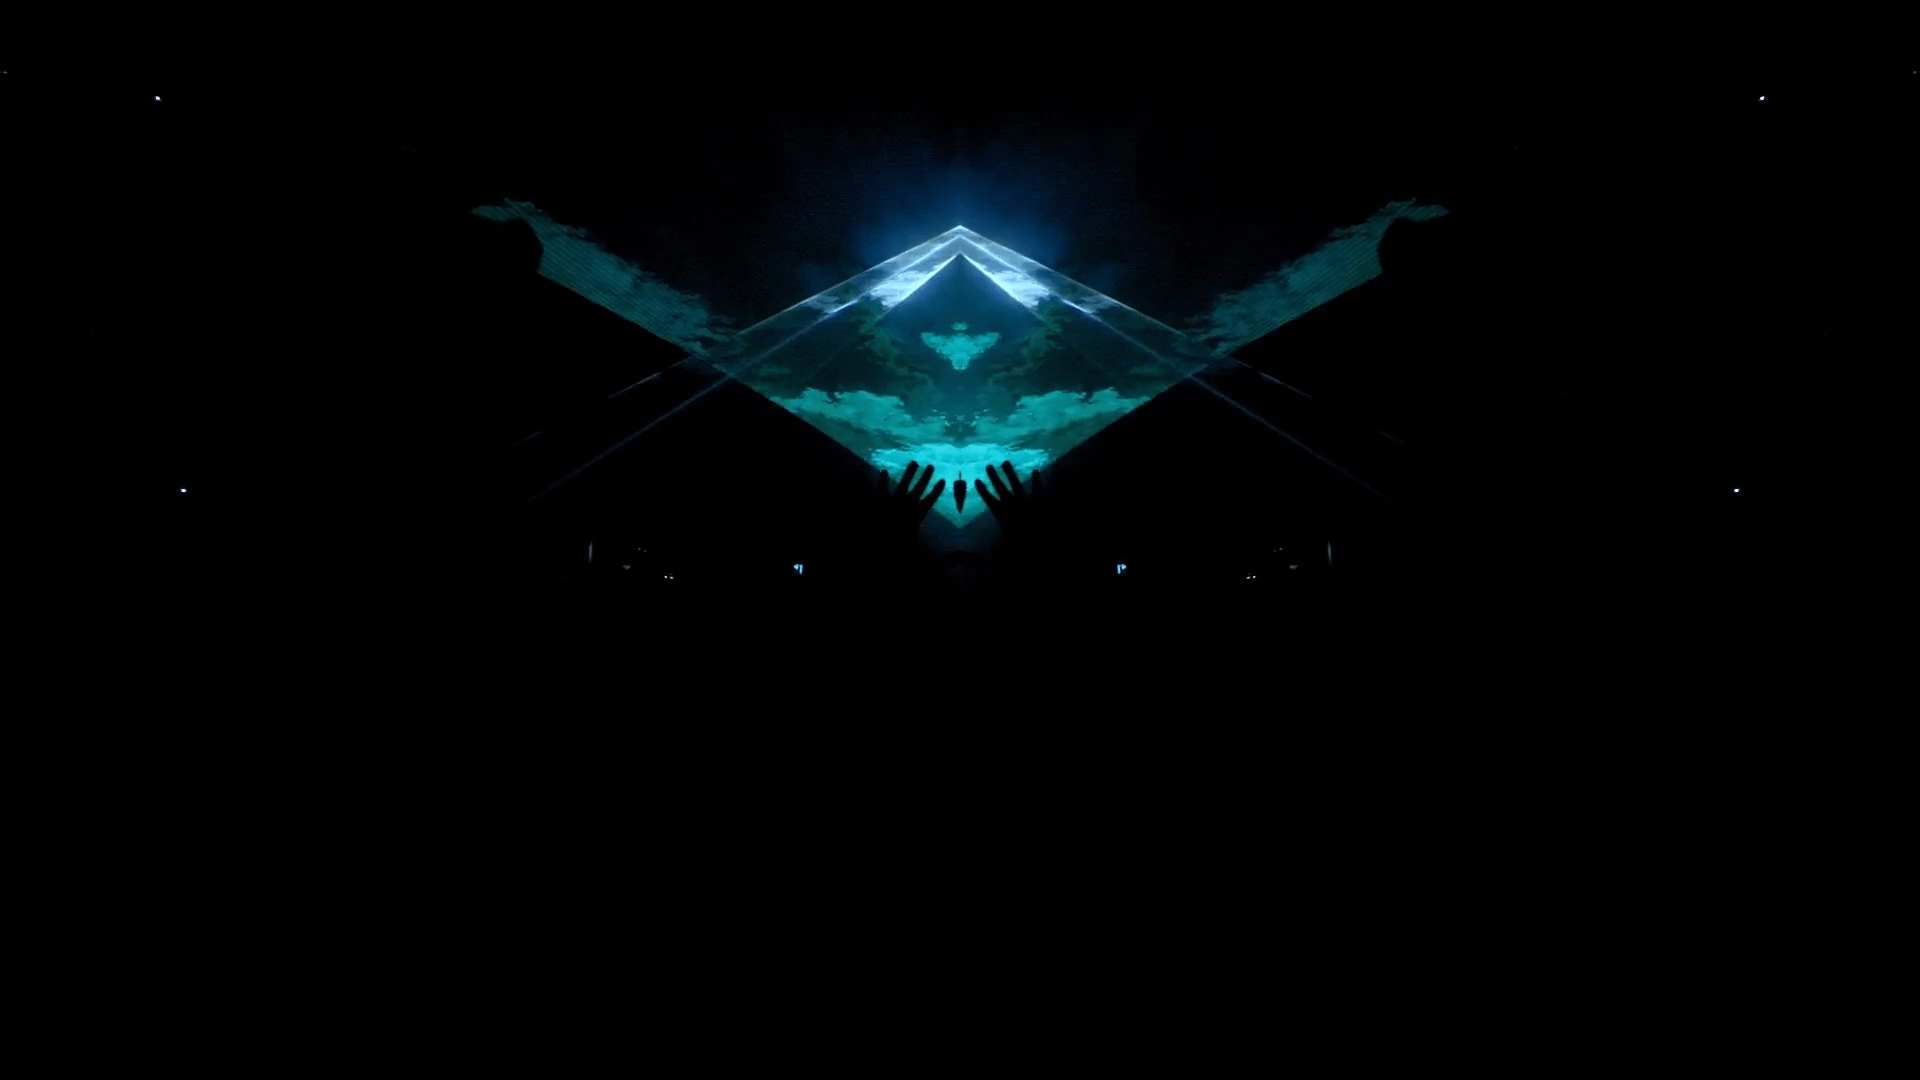 illuminati symbol wallpaper 1920x1080 - photo #7